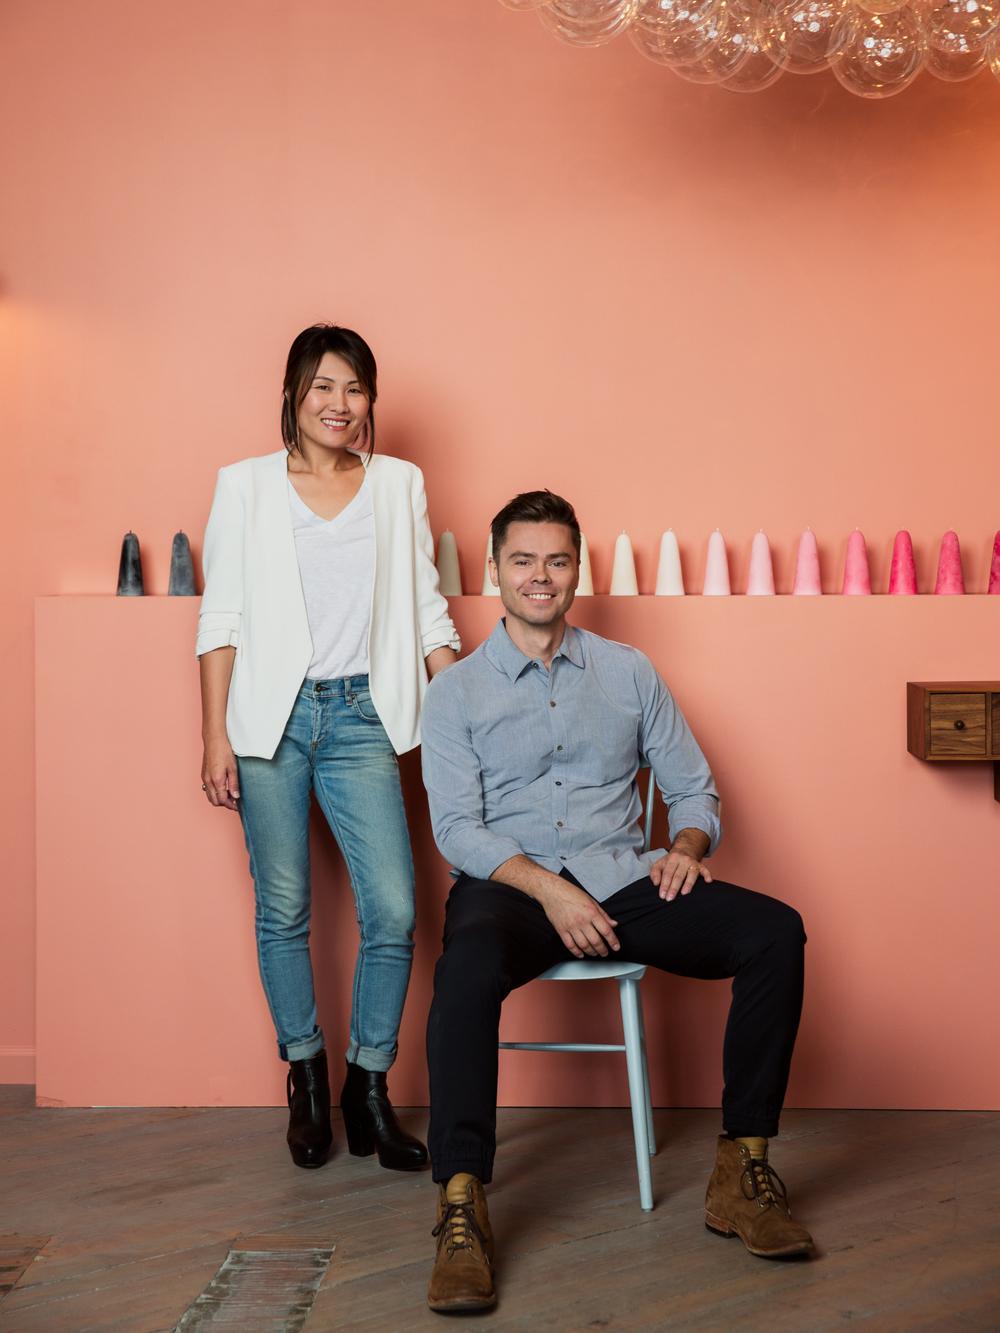 Jean & Oliver Pelle, Co-founders of Pelle Designs